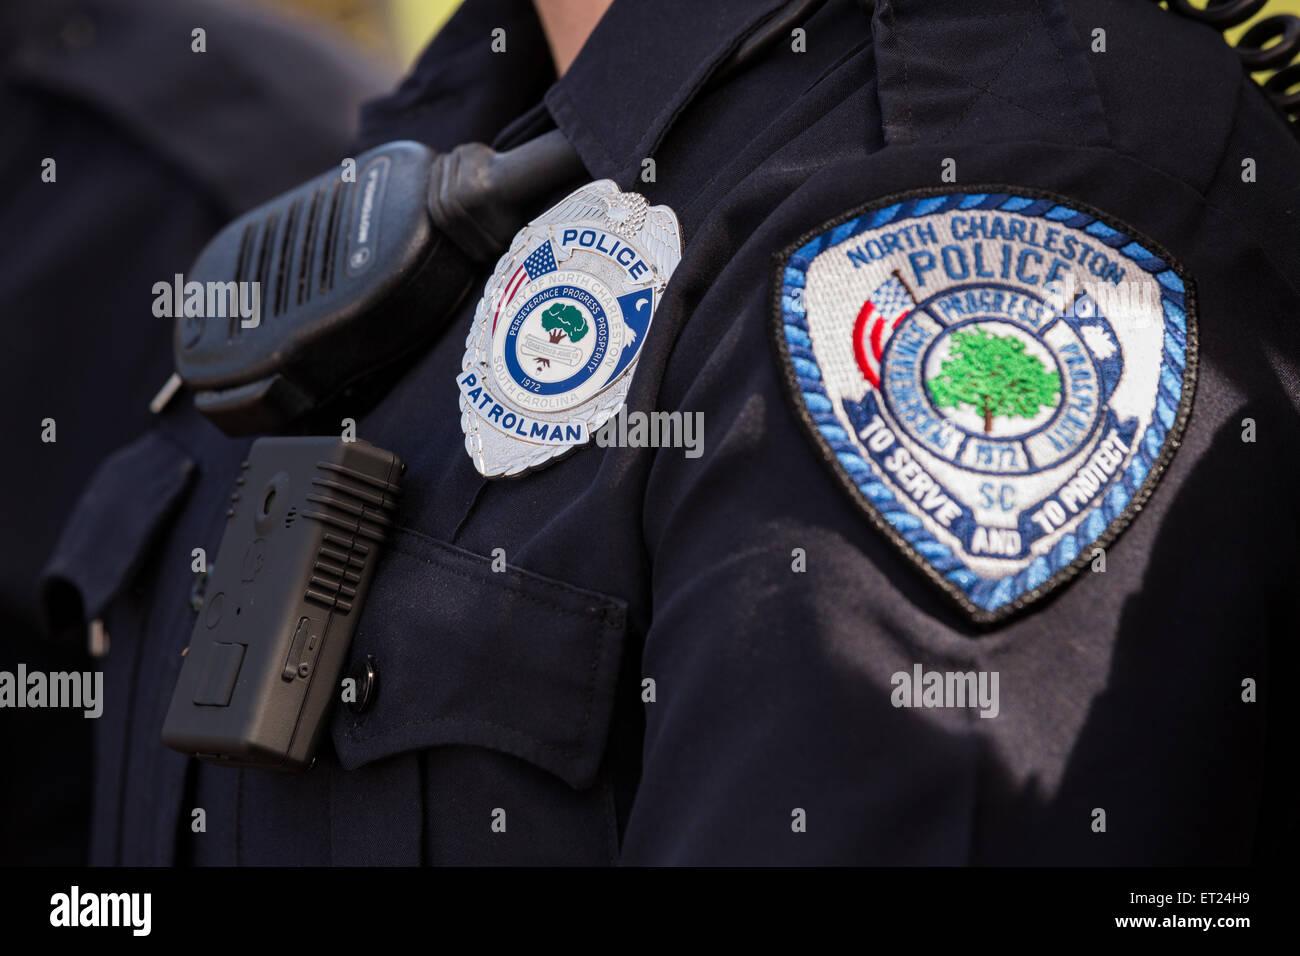 Police Badge Emblem Stock Photos & Police Badge Emblem Stock Images